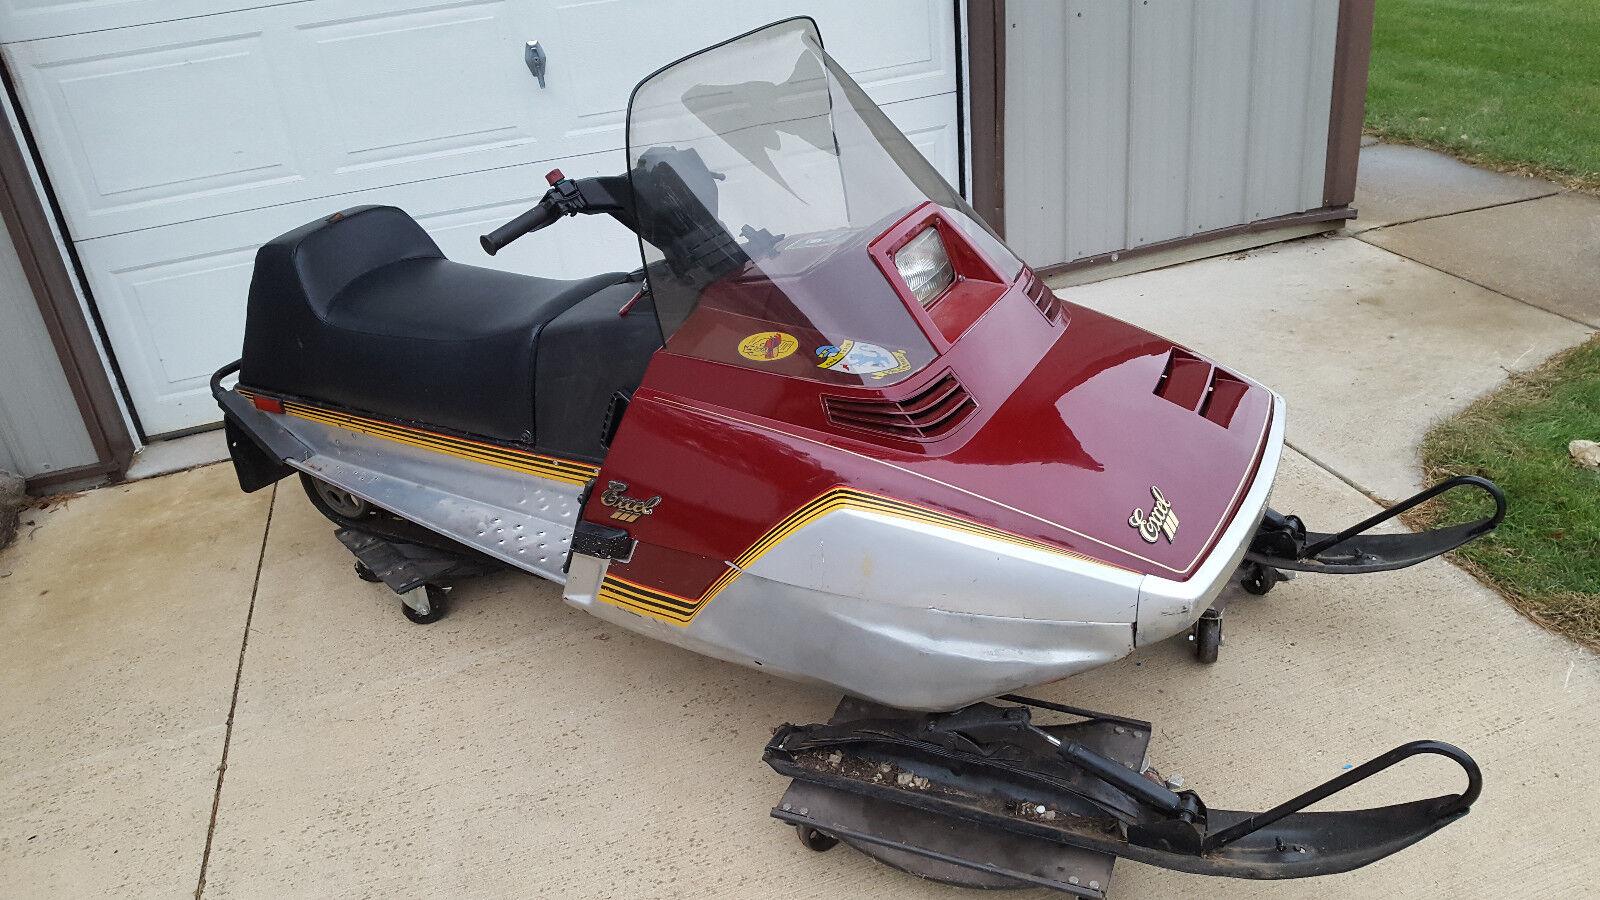 1984 Yamaha Excel III 340 Vintage Snowmobile